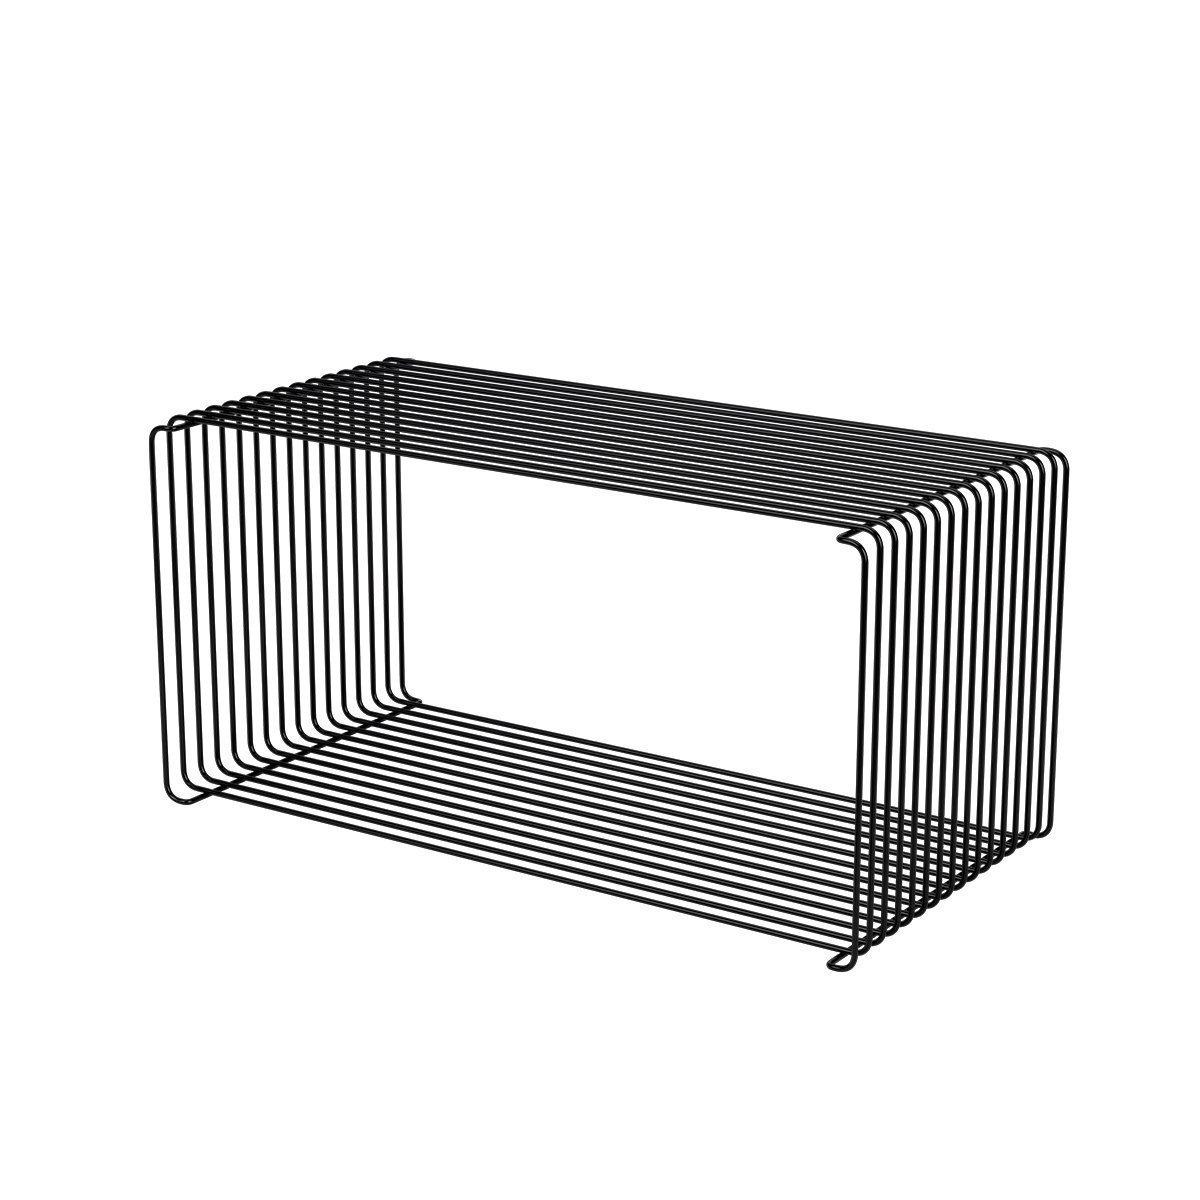 Montana Panton Wire Extended - d. 34.8 cm. - Zwart